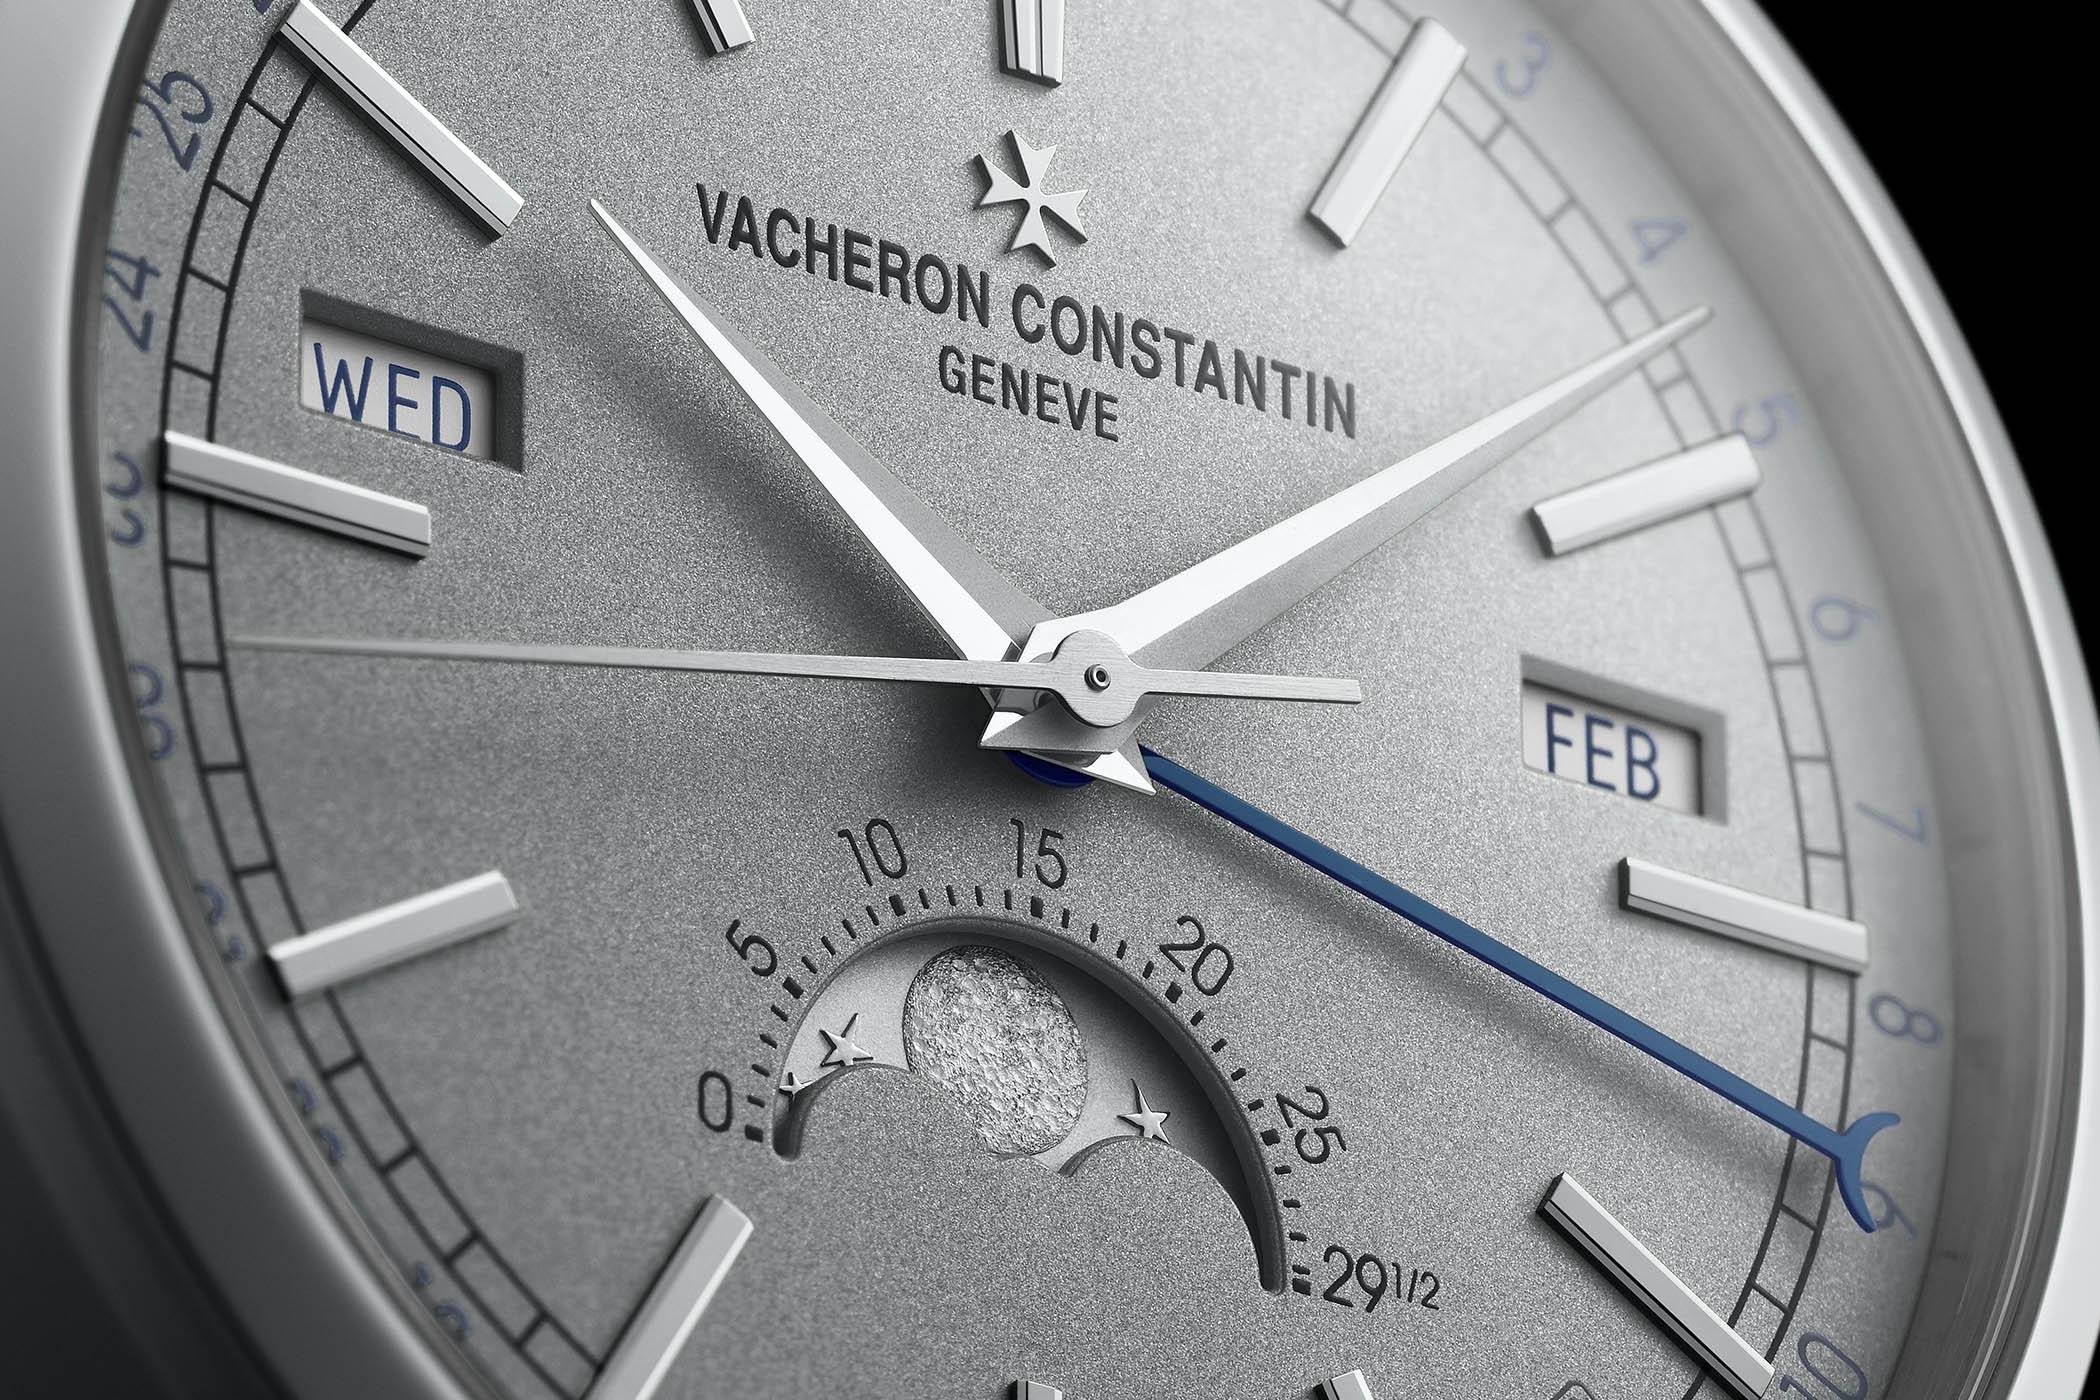 Vacheron Constantin Traditionnelle Complete Calendar Excellence Platine 4010T - Pre-SIHH 2018